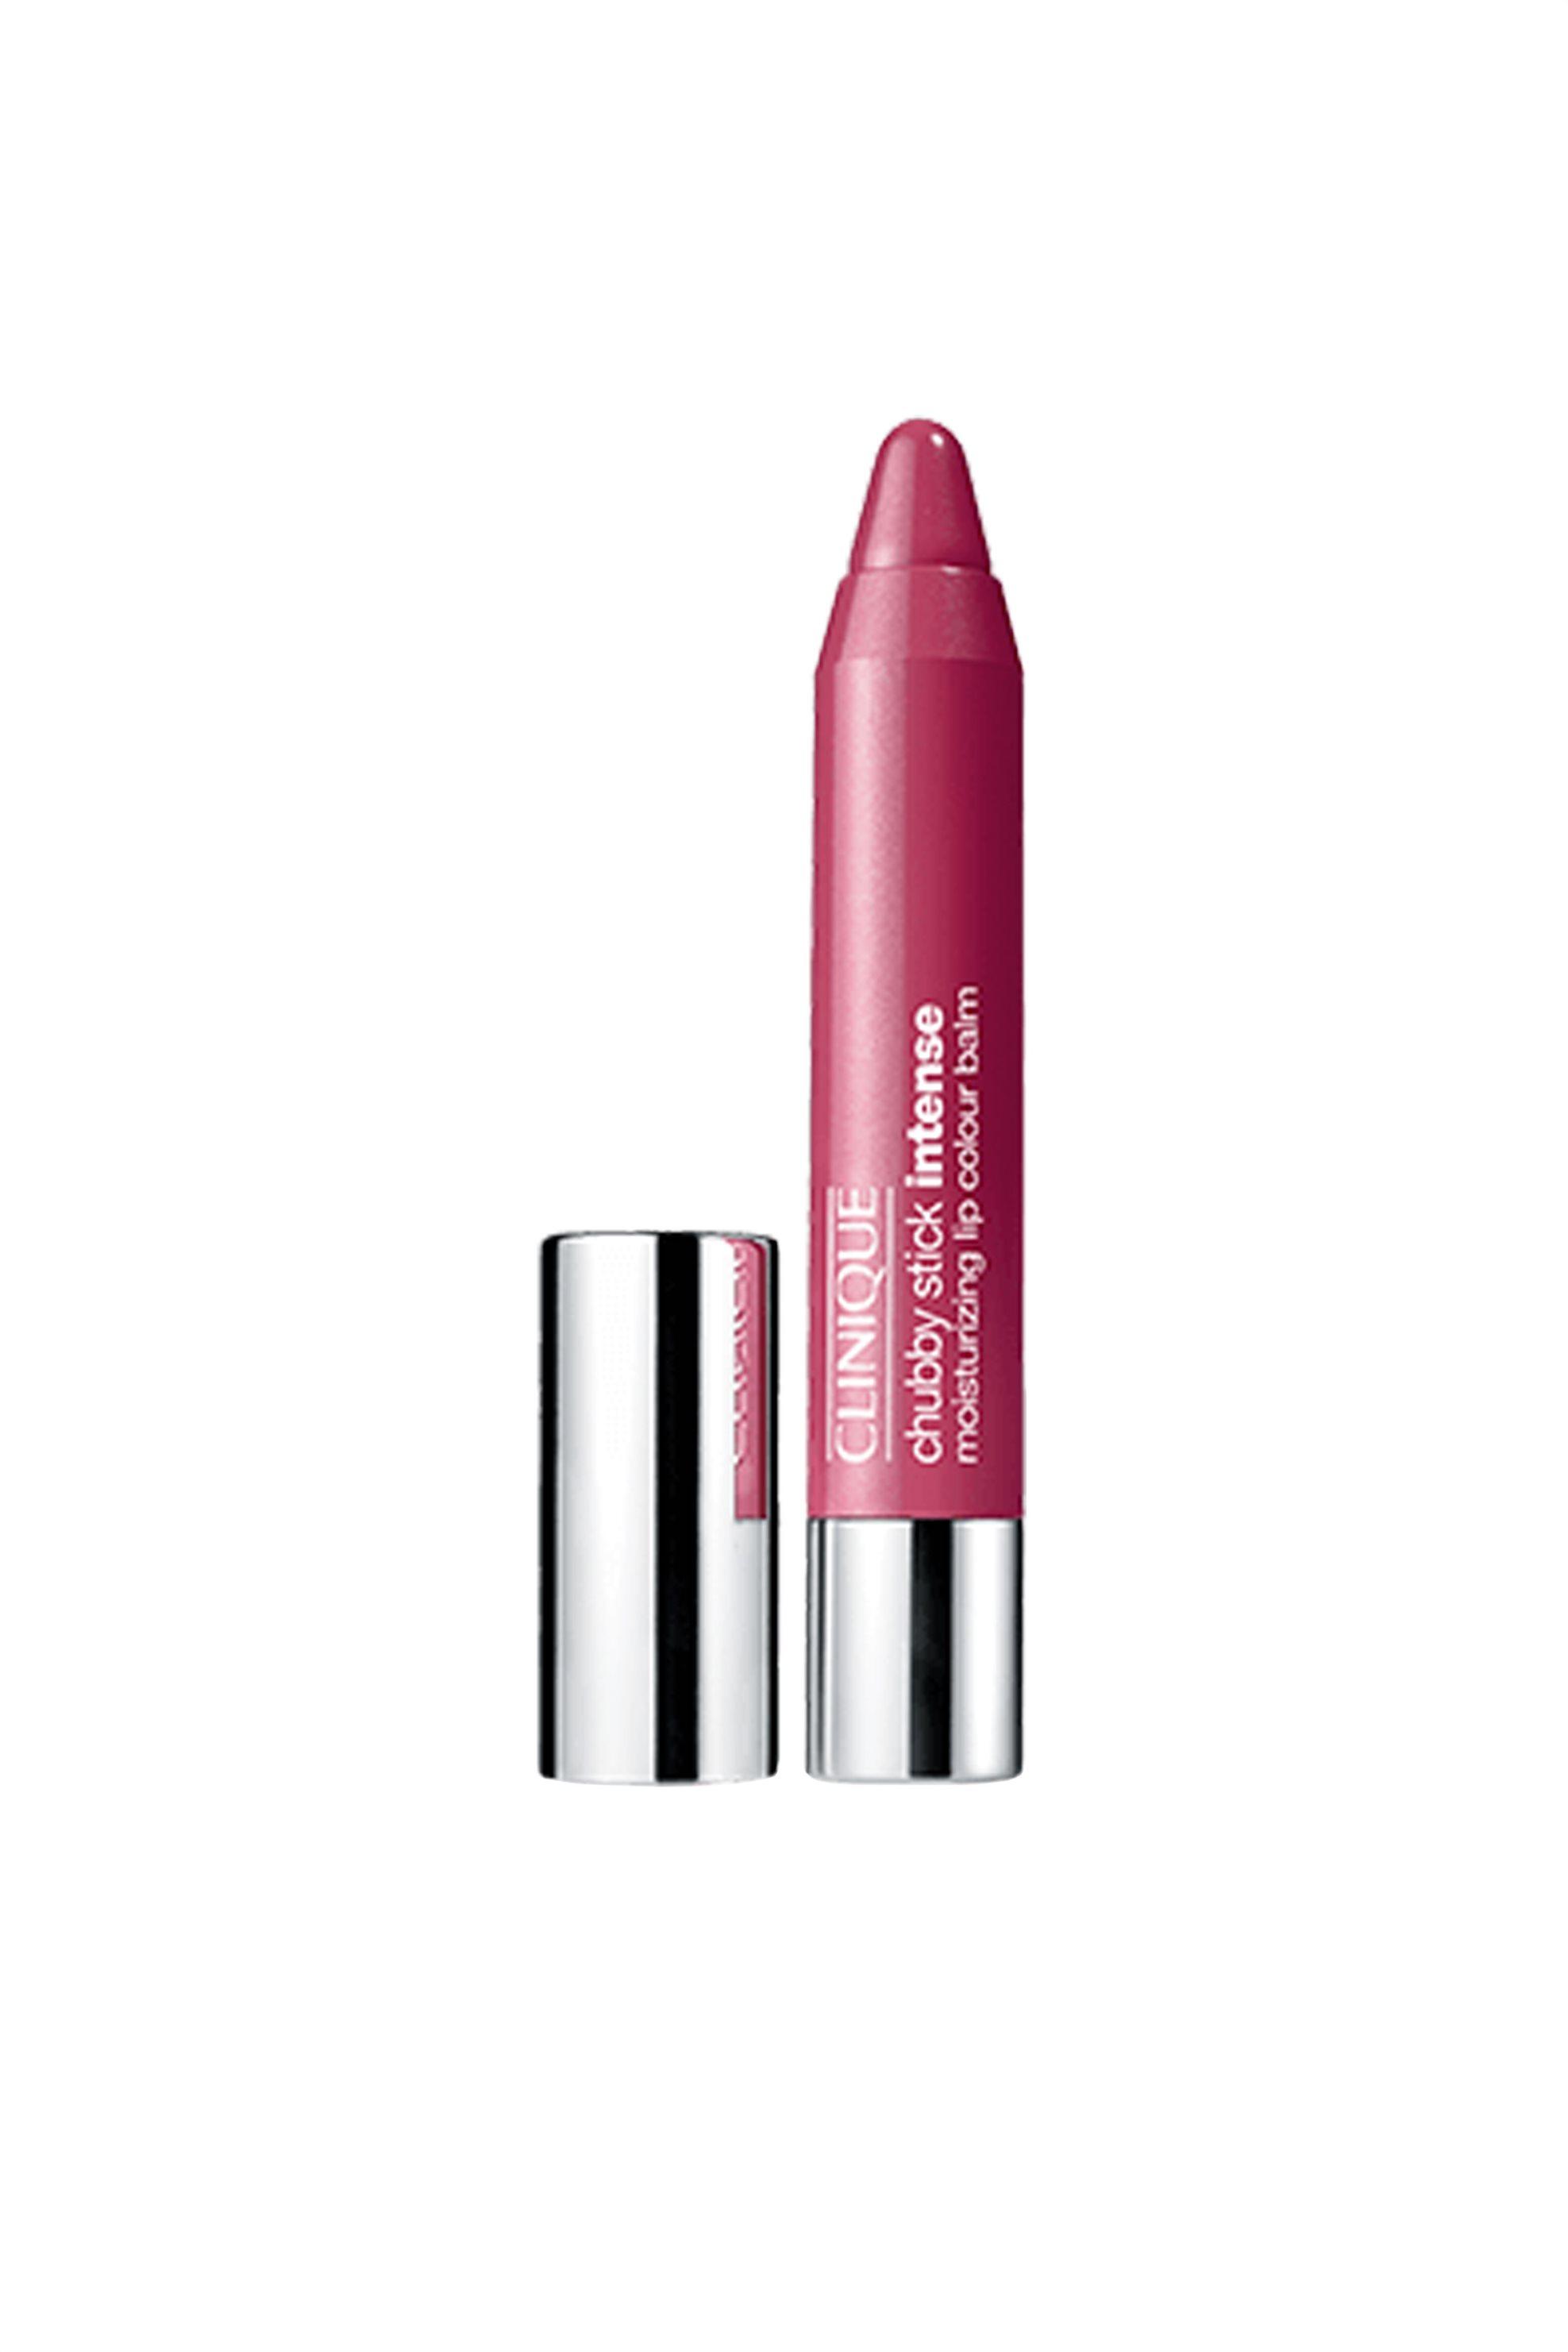 Clinique Chubby Stick Intense™ Moisturizing Lip Colour Balm 06 Roomiest Rose 3 g ομορφια   καλλυντικα επιλεκτικησ   μακιγιάζ   χείλη   lip gloss   balms